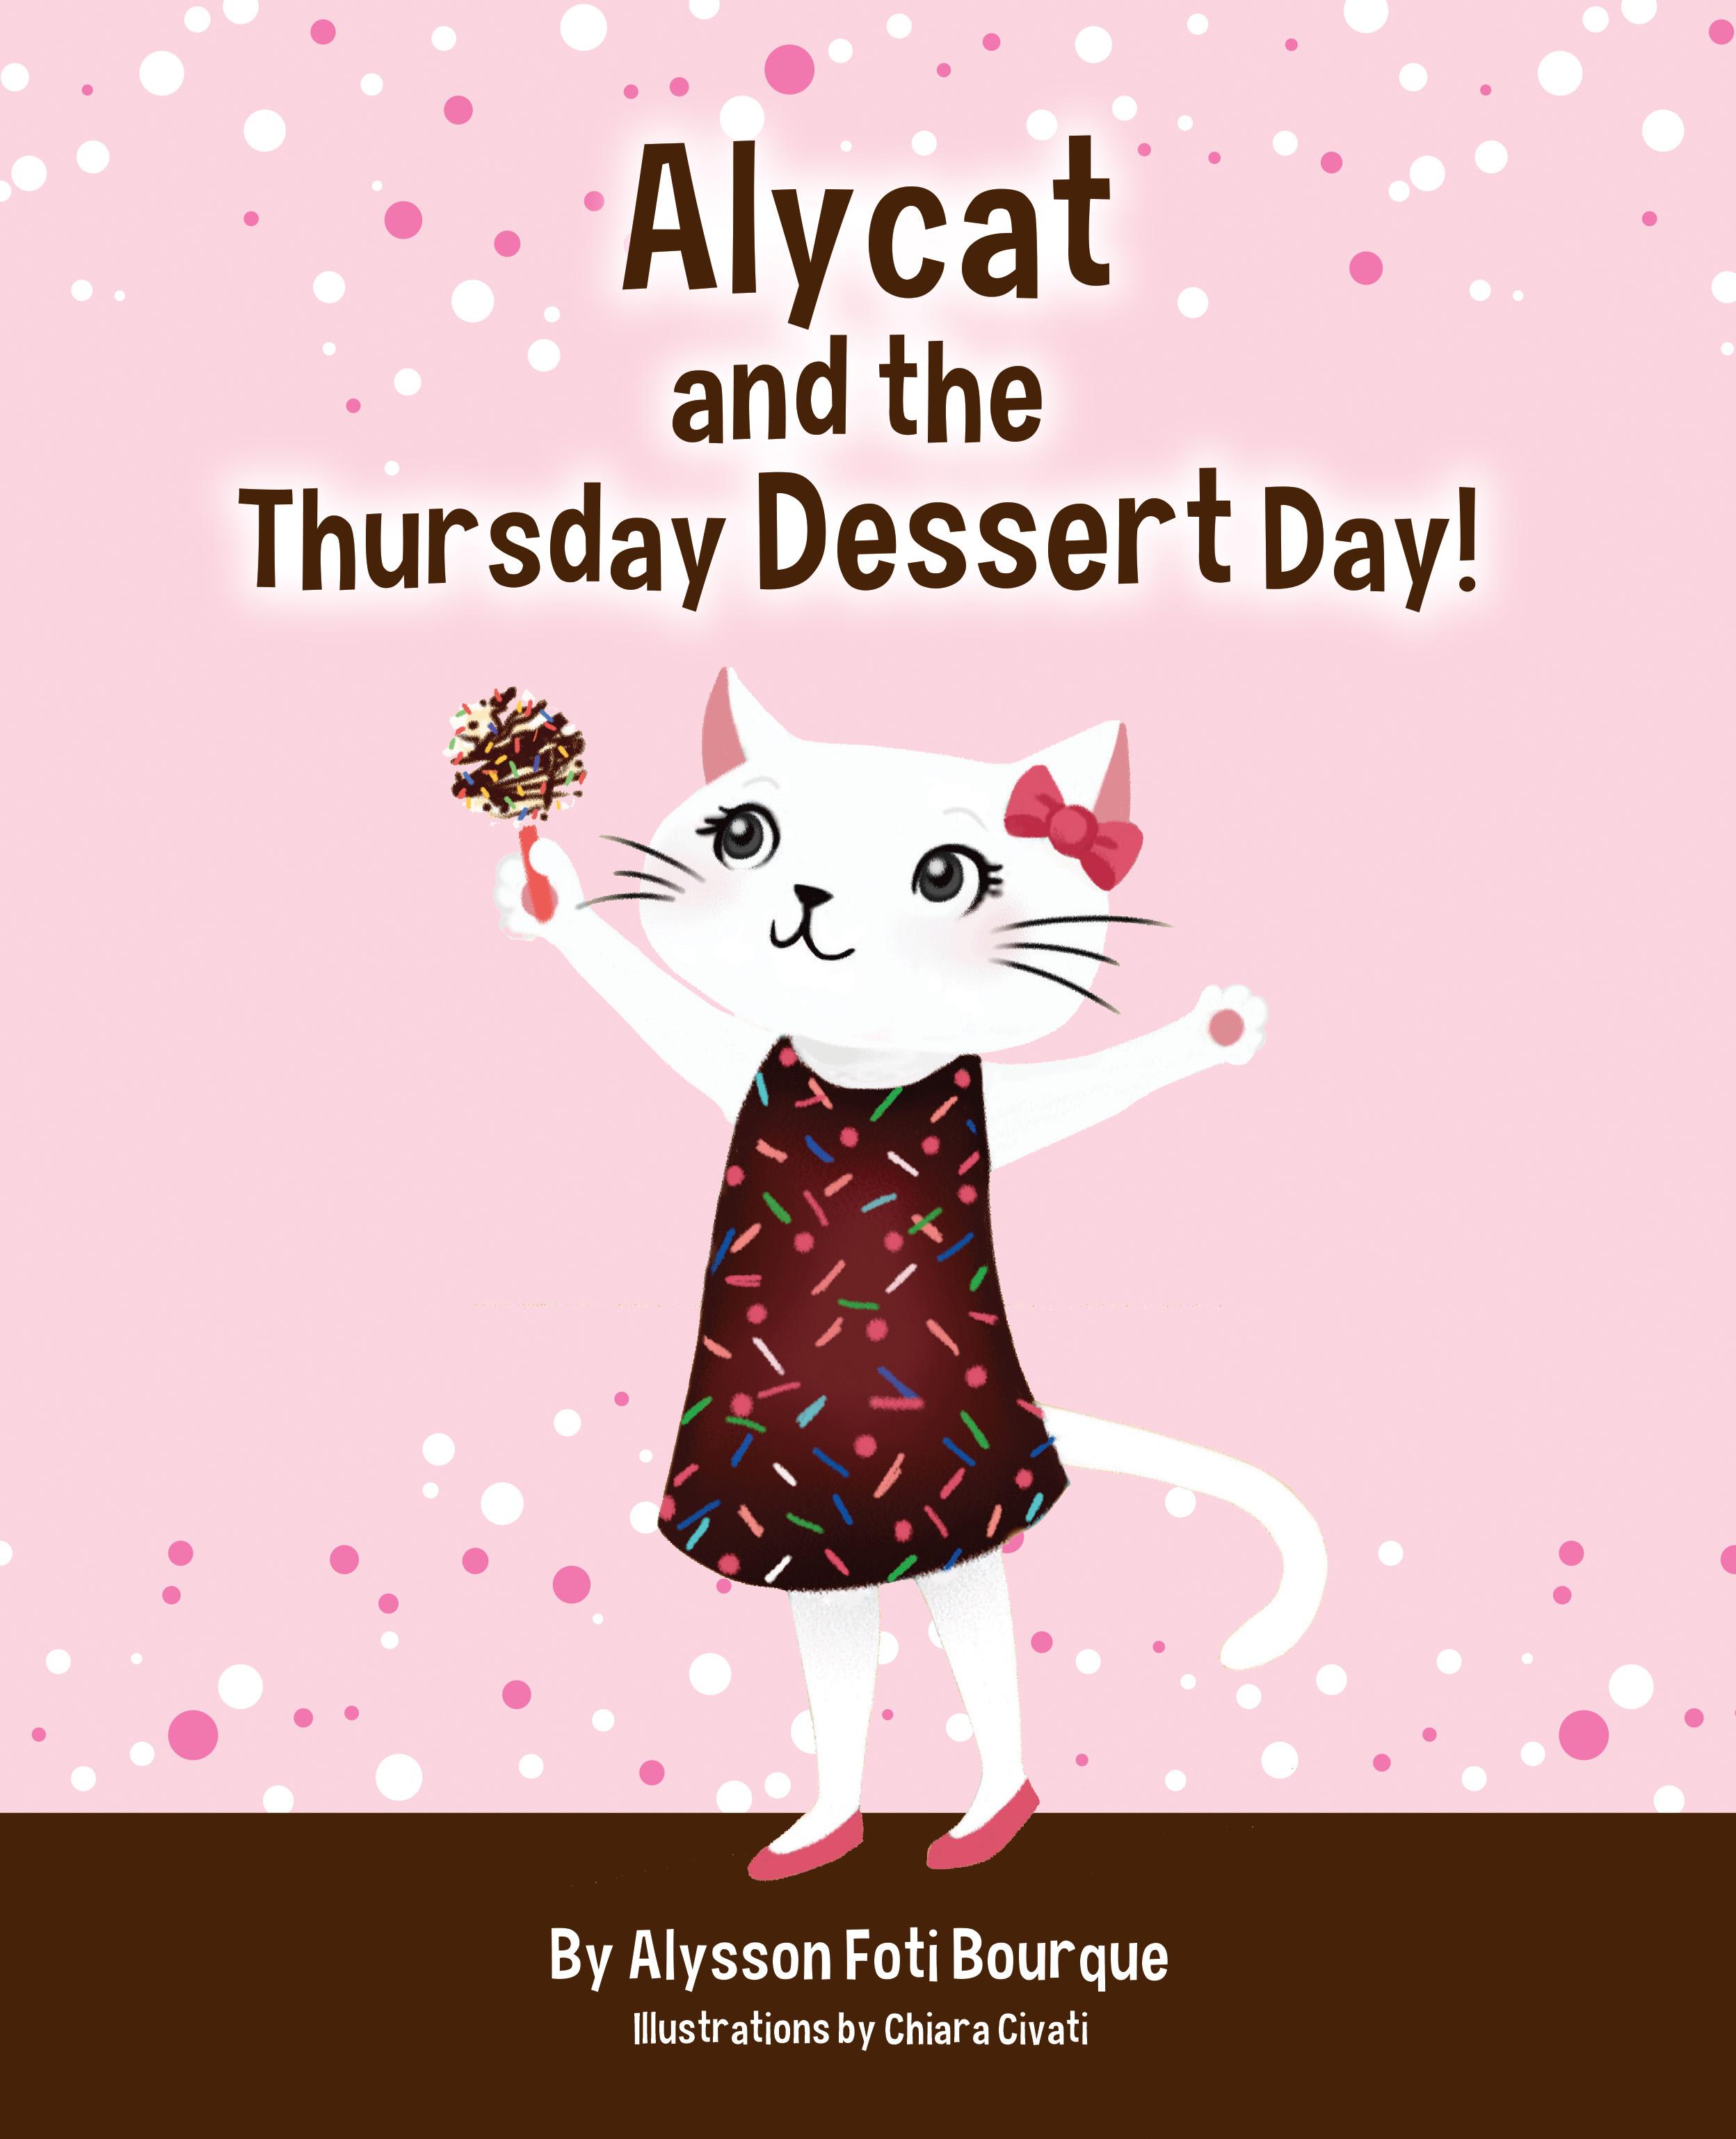 alycatandthethursdaydessert_cover